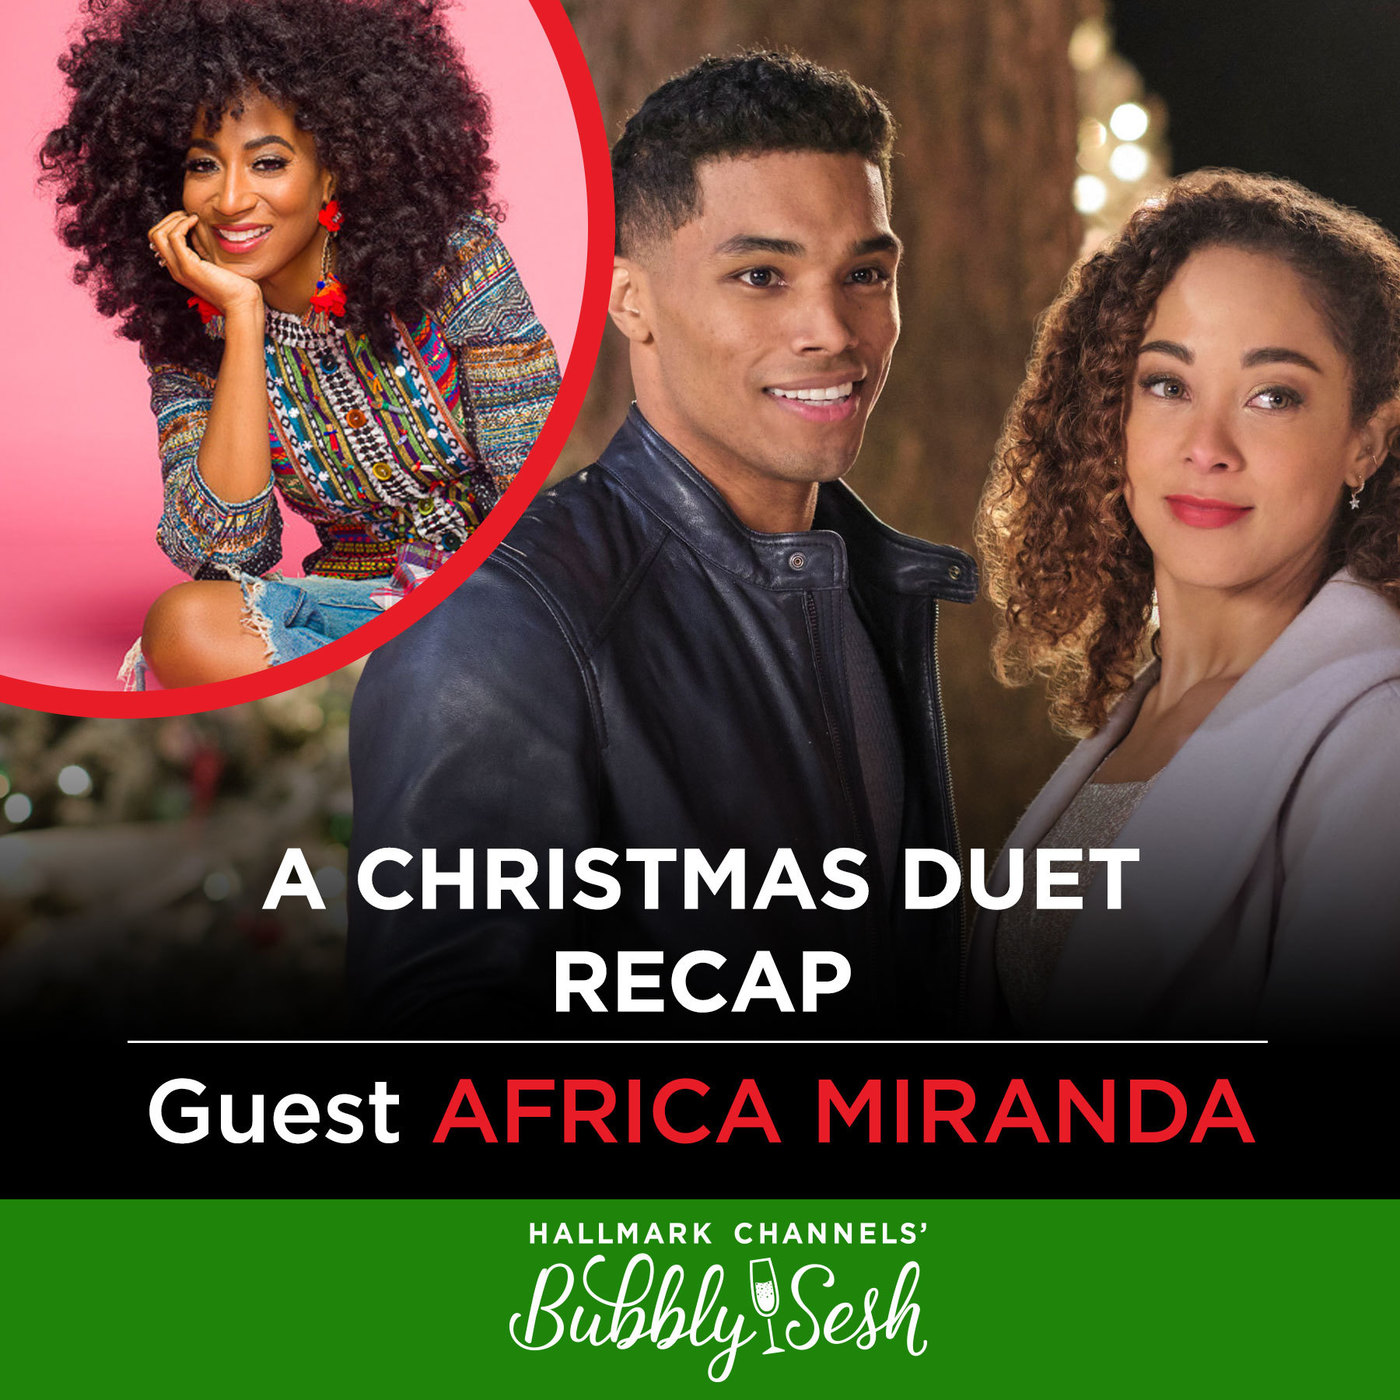 A Christmas Duet Recap with Africa Miranda